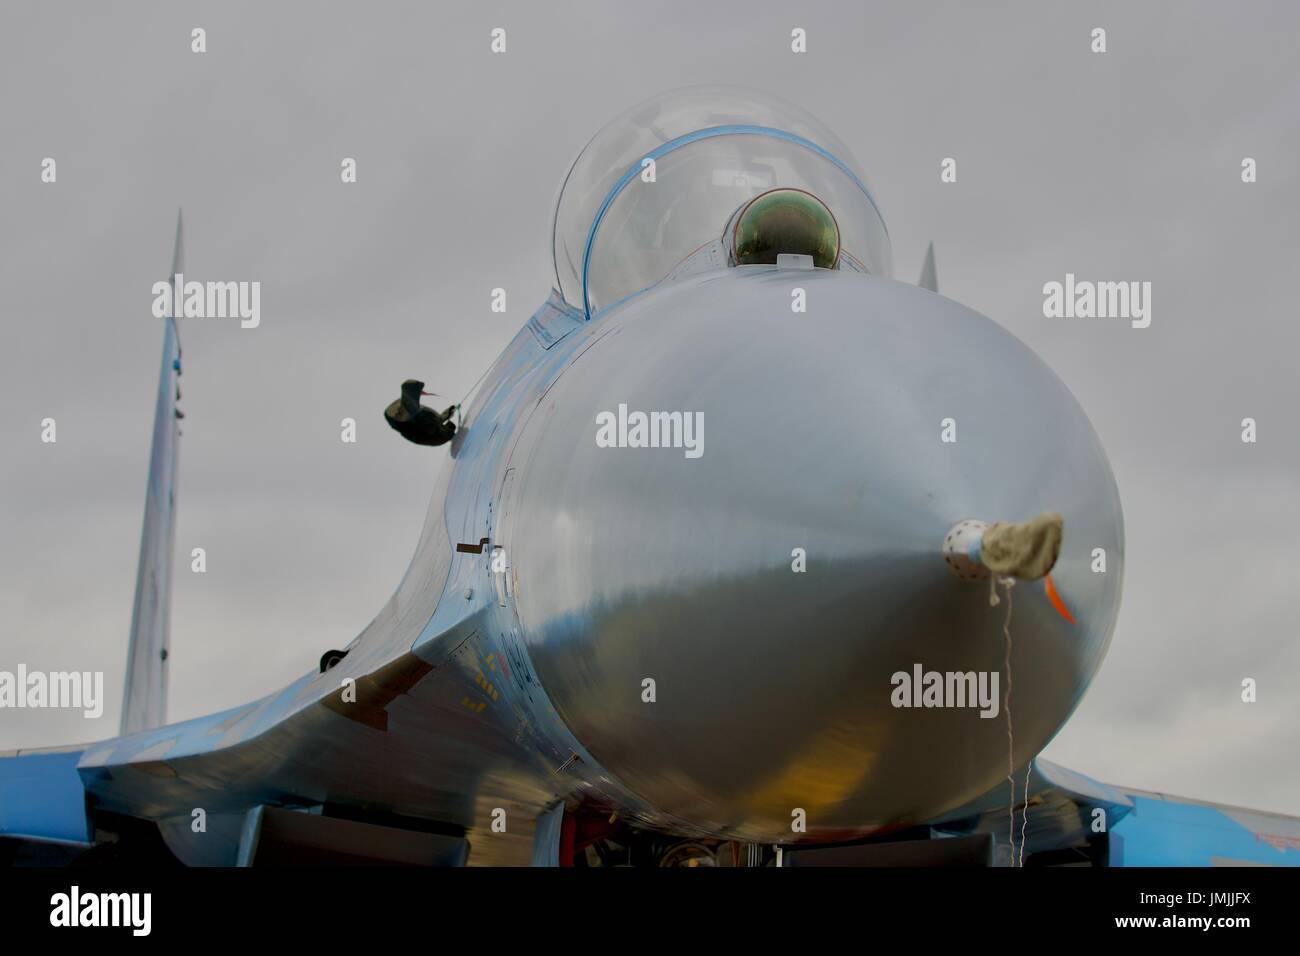 Ukrainian Air Force Su-27 Flanker on static display at the Royal International Air Tattoo 2017 - Stock Image